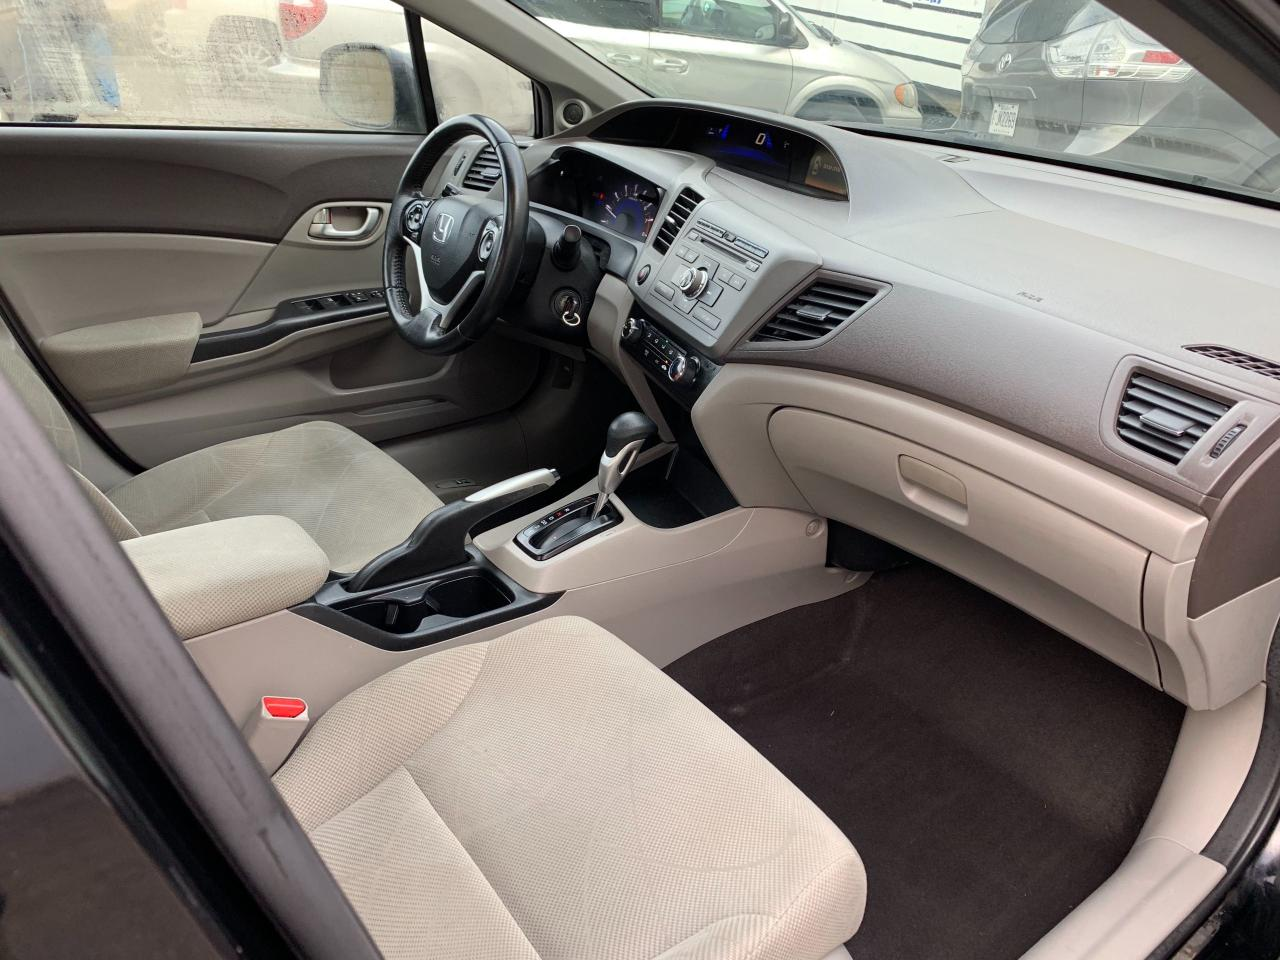 2012 Honda Civic EX, Sunroof, Bluetooth